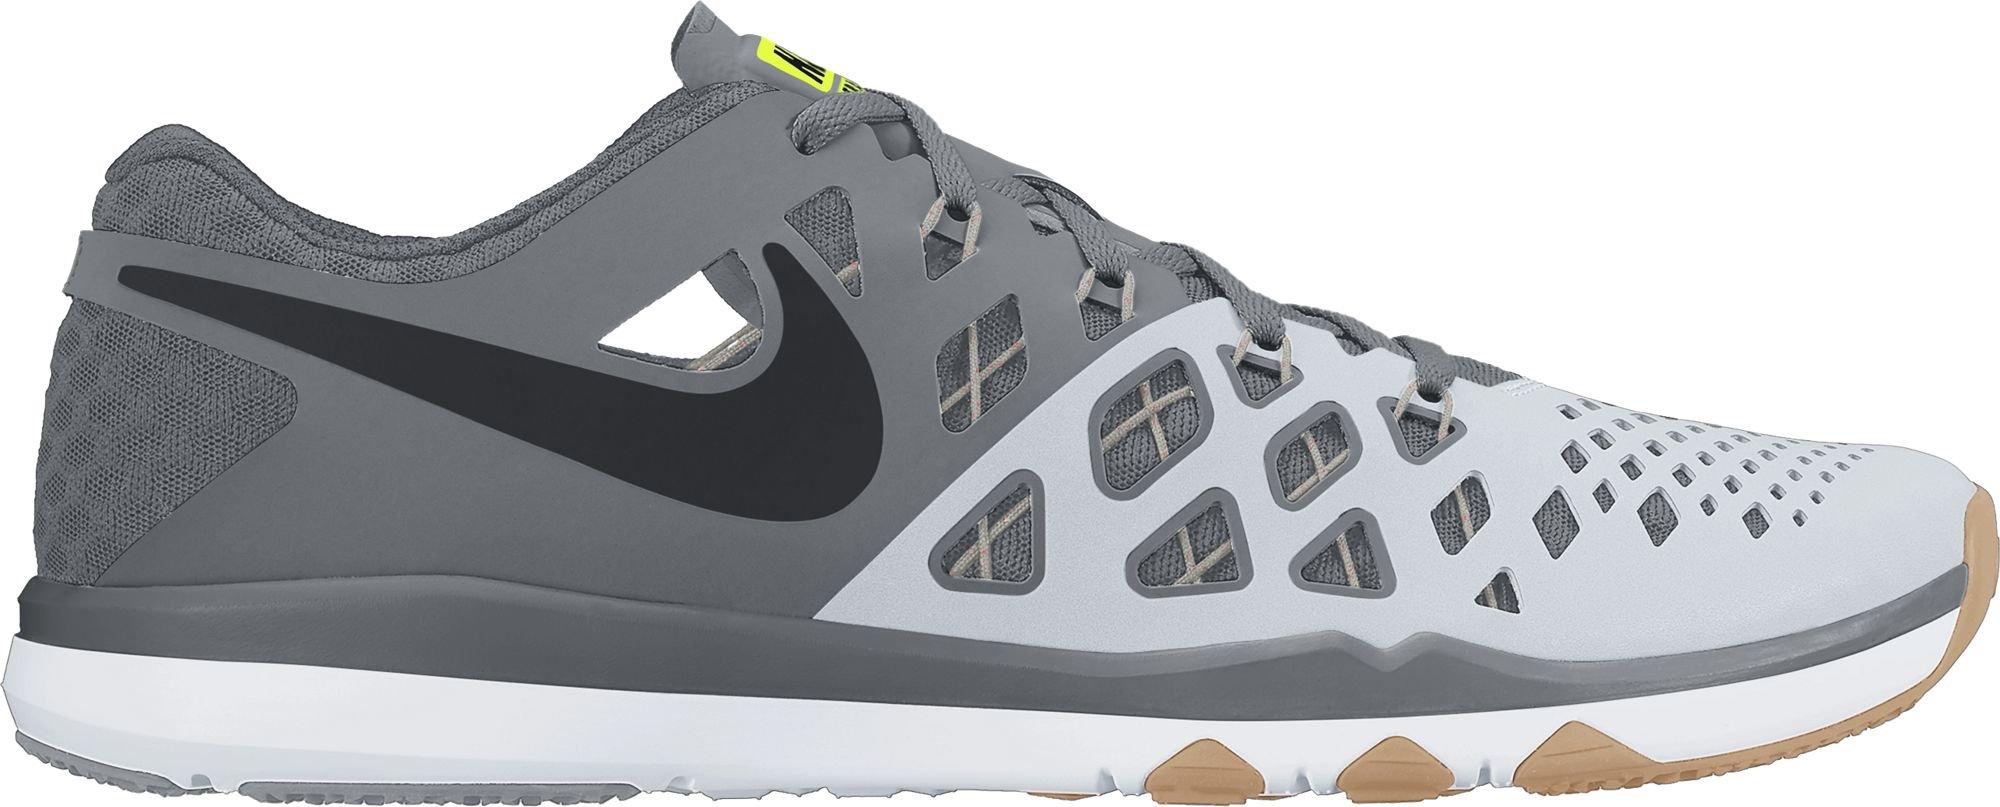 f45743aa281d Galleon - Nike Men s Train Speed 4 Training Shoe Pure Platinum Black Cool  Grey Size 12 M US